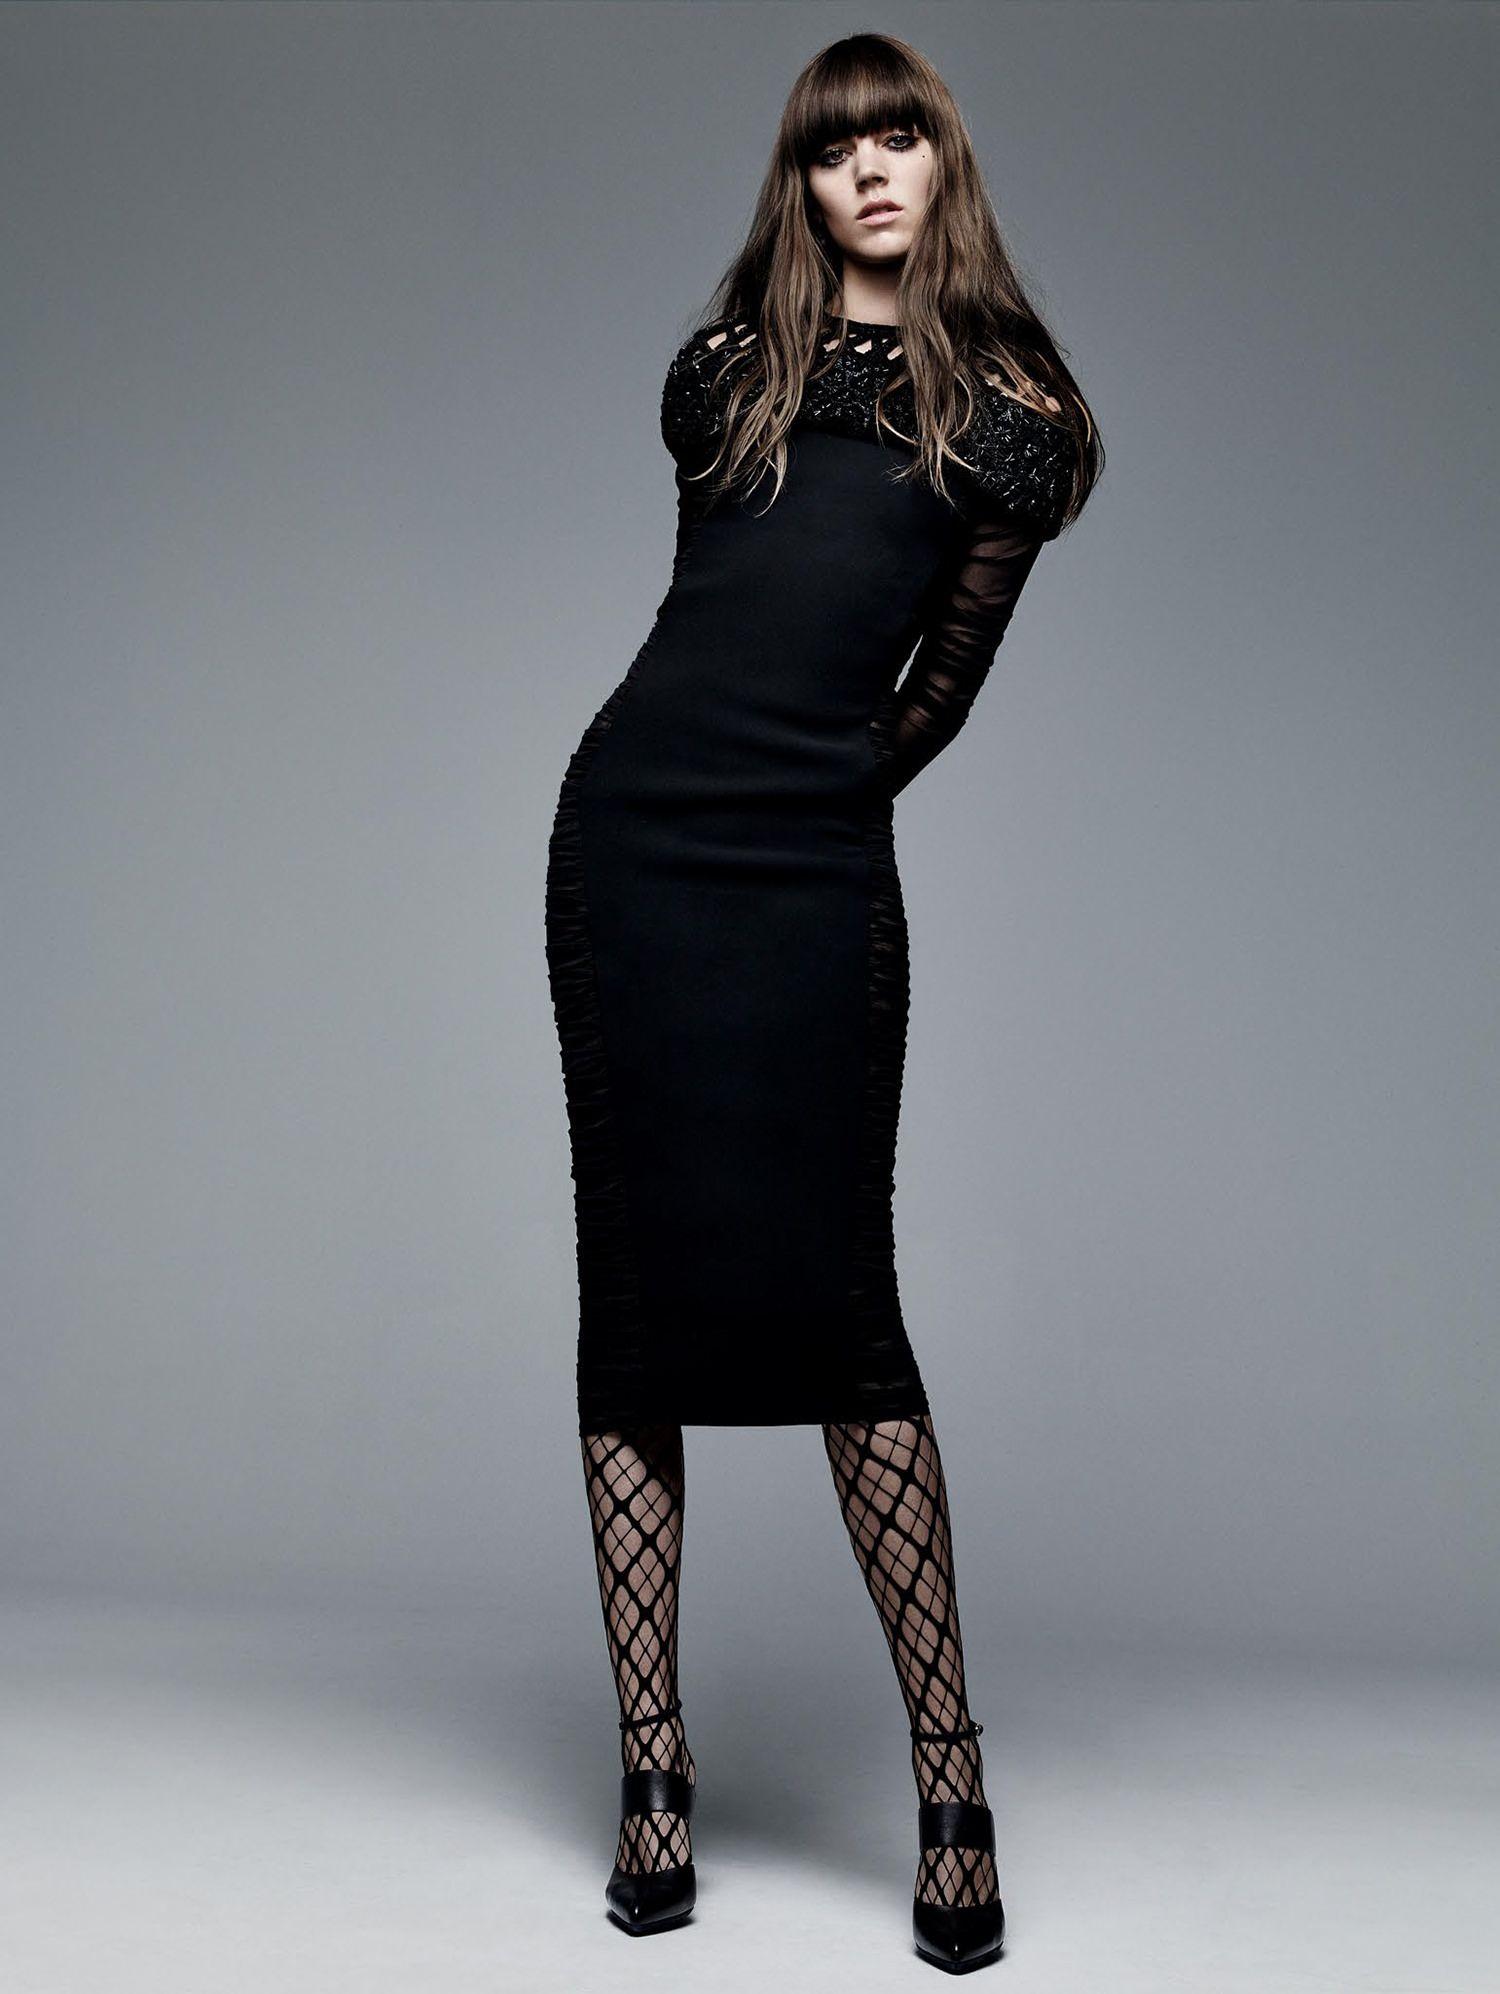 Freja Beha Erichsen Vogue China April 2015